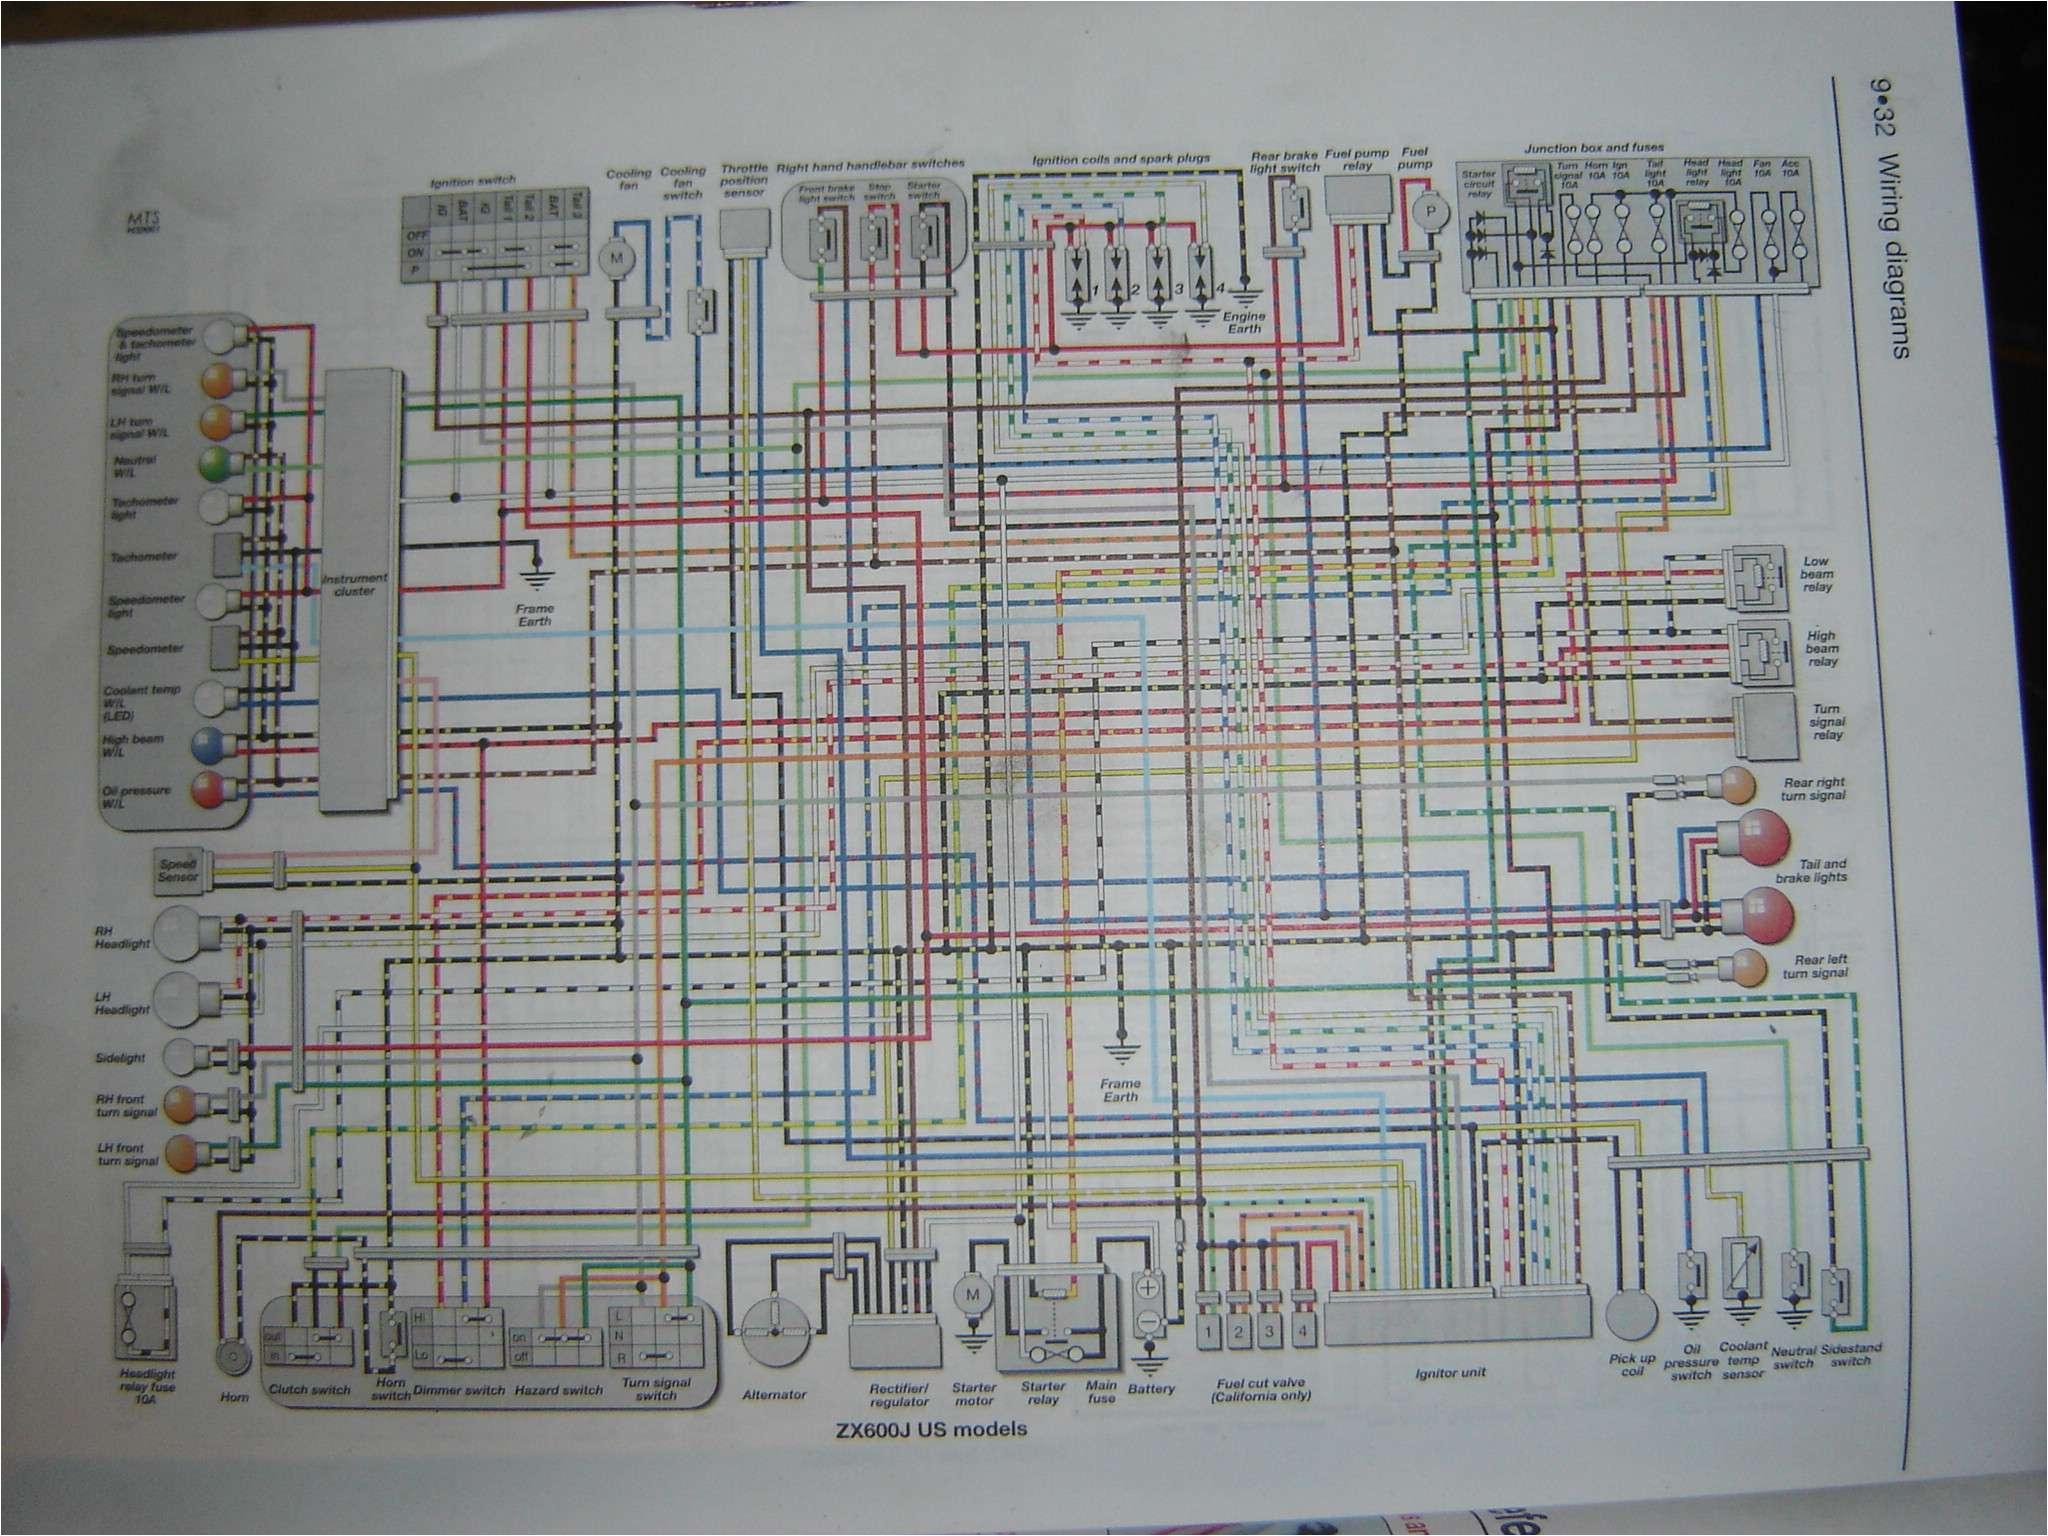 kawasaki zx636r wiring harness wiring diagram03 kawasaki zx6r wiring diagram schematic diagram03 kawasaki 636 wiring diagram